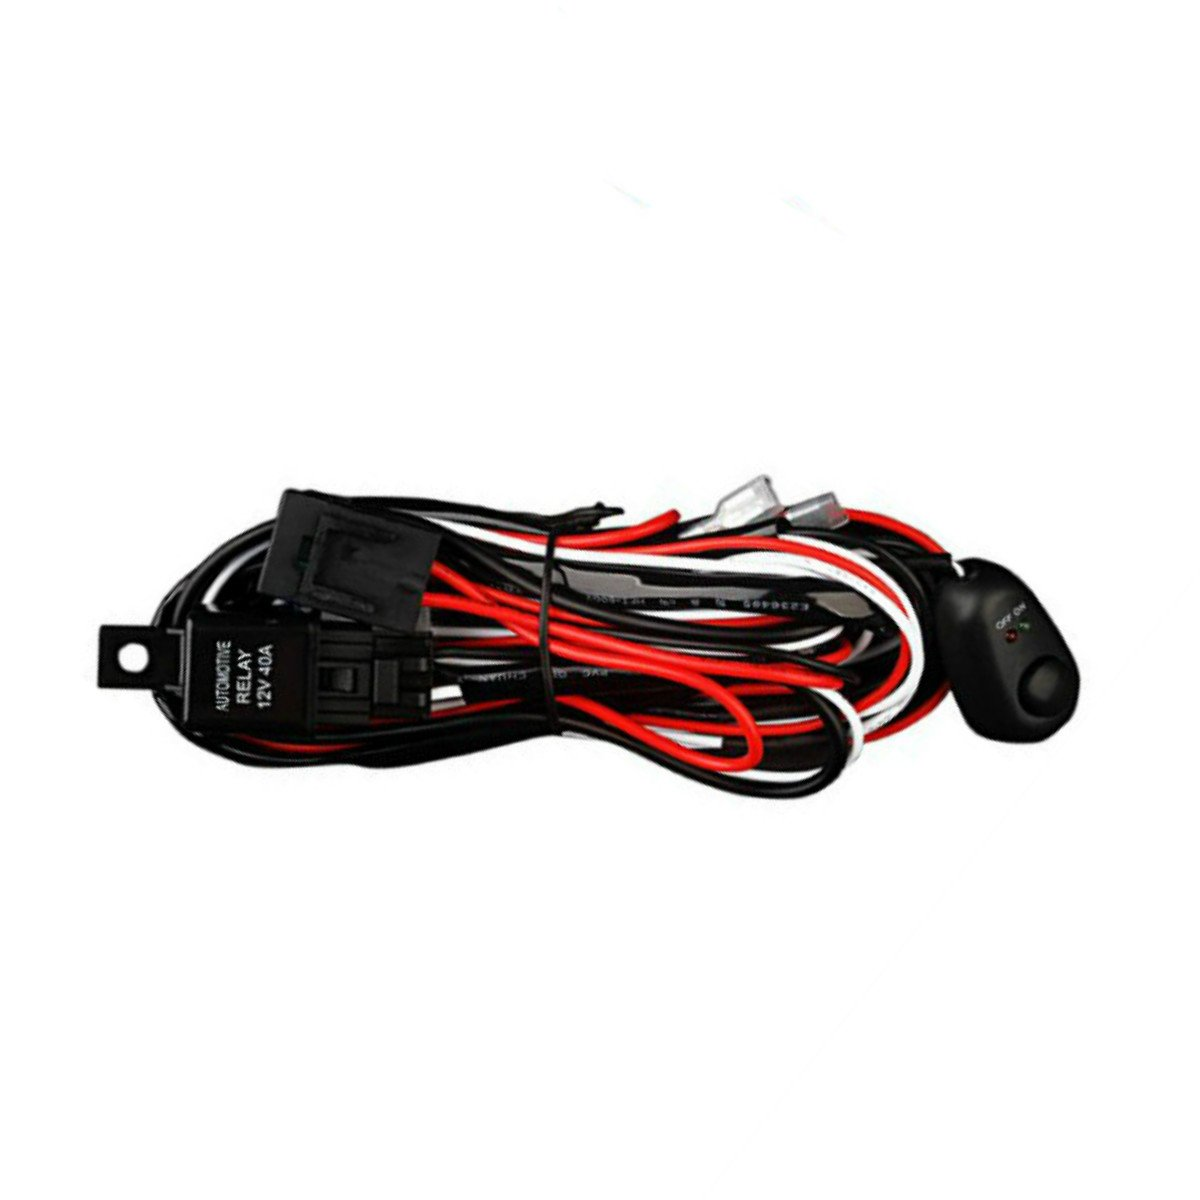 car alarm wire diagram fog light relay wiring wiring library Cornering Light Wiring Diagram amazon com led light bar yitamotor 2 leads car lights wiring harness heavy duty